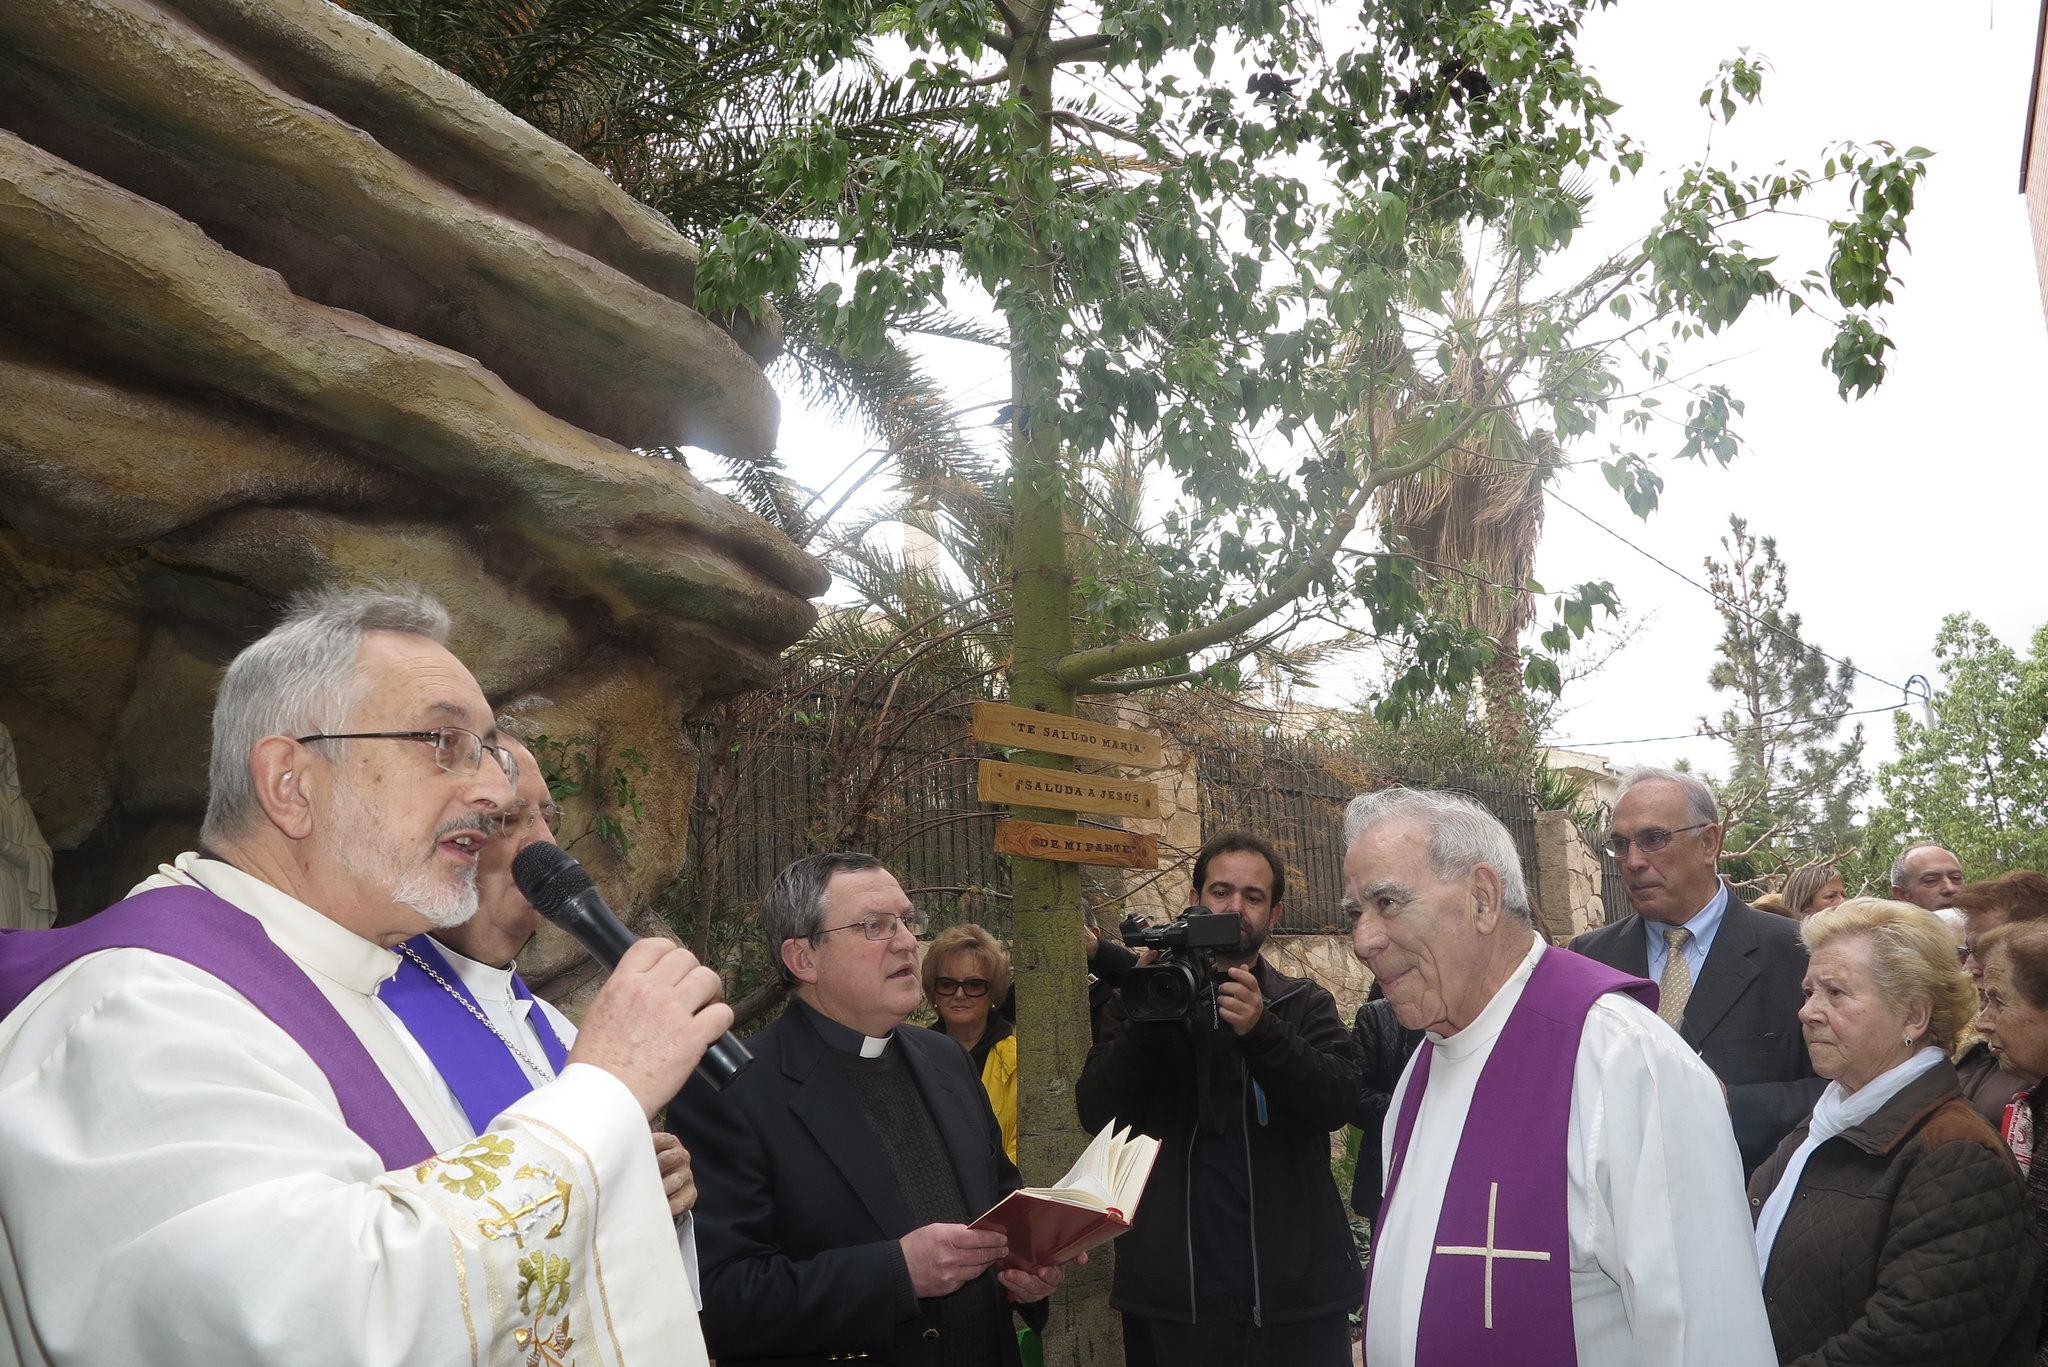 (2016-02-13) - Inauguración Virgen de Lourdes, La Molineta - Archivo La Molineta 2 (46)